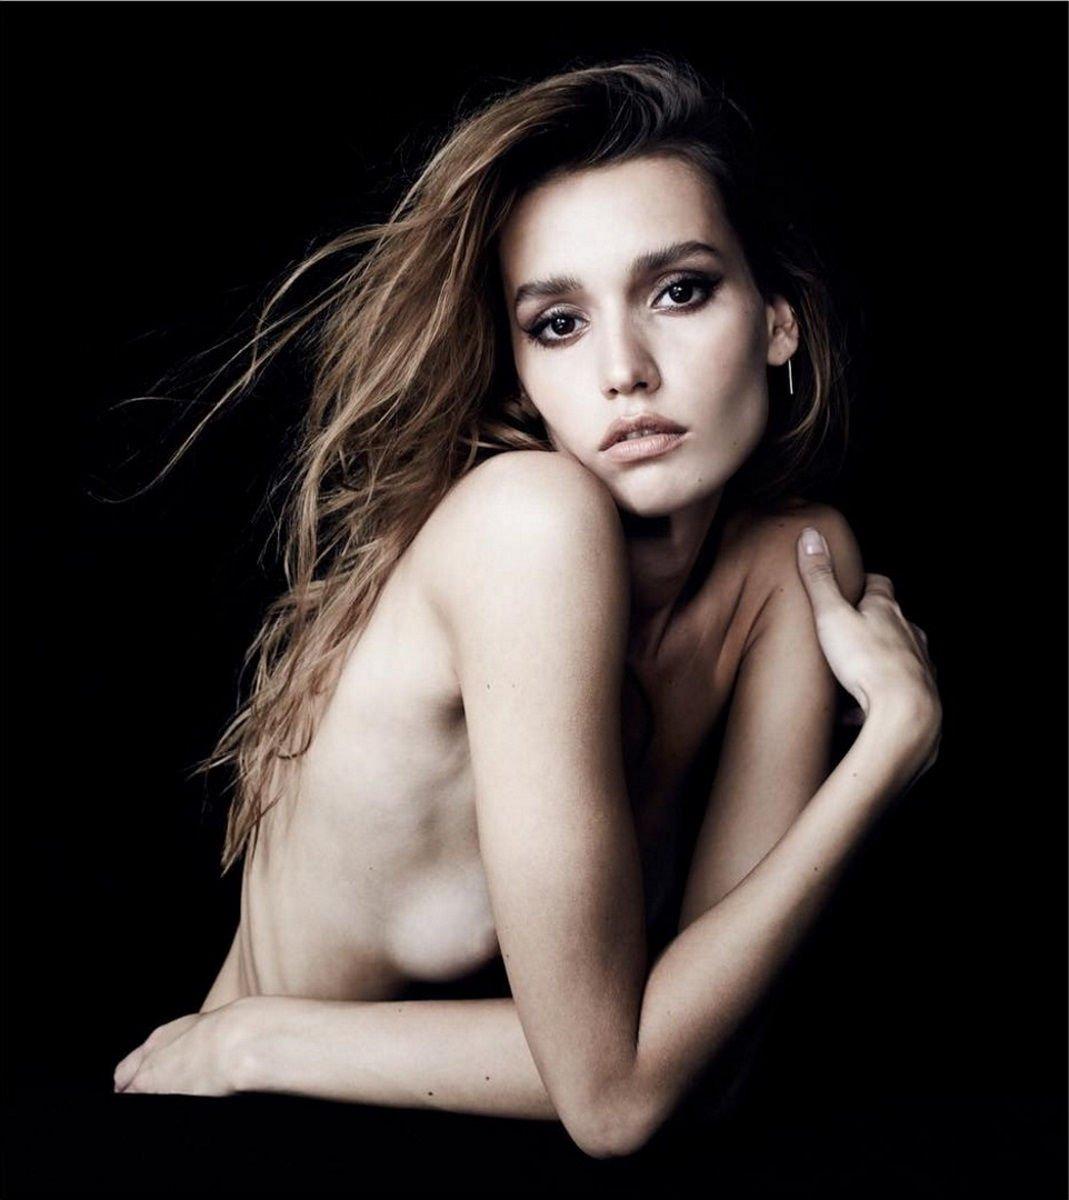 Young Topless Mariya Melnyk  nude (53 fotos), Snapchat, braless